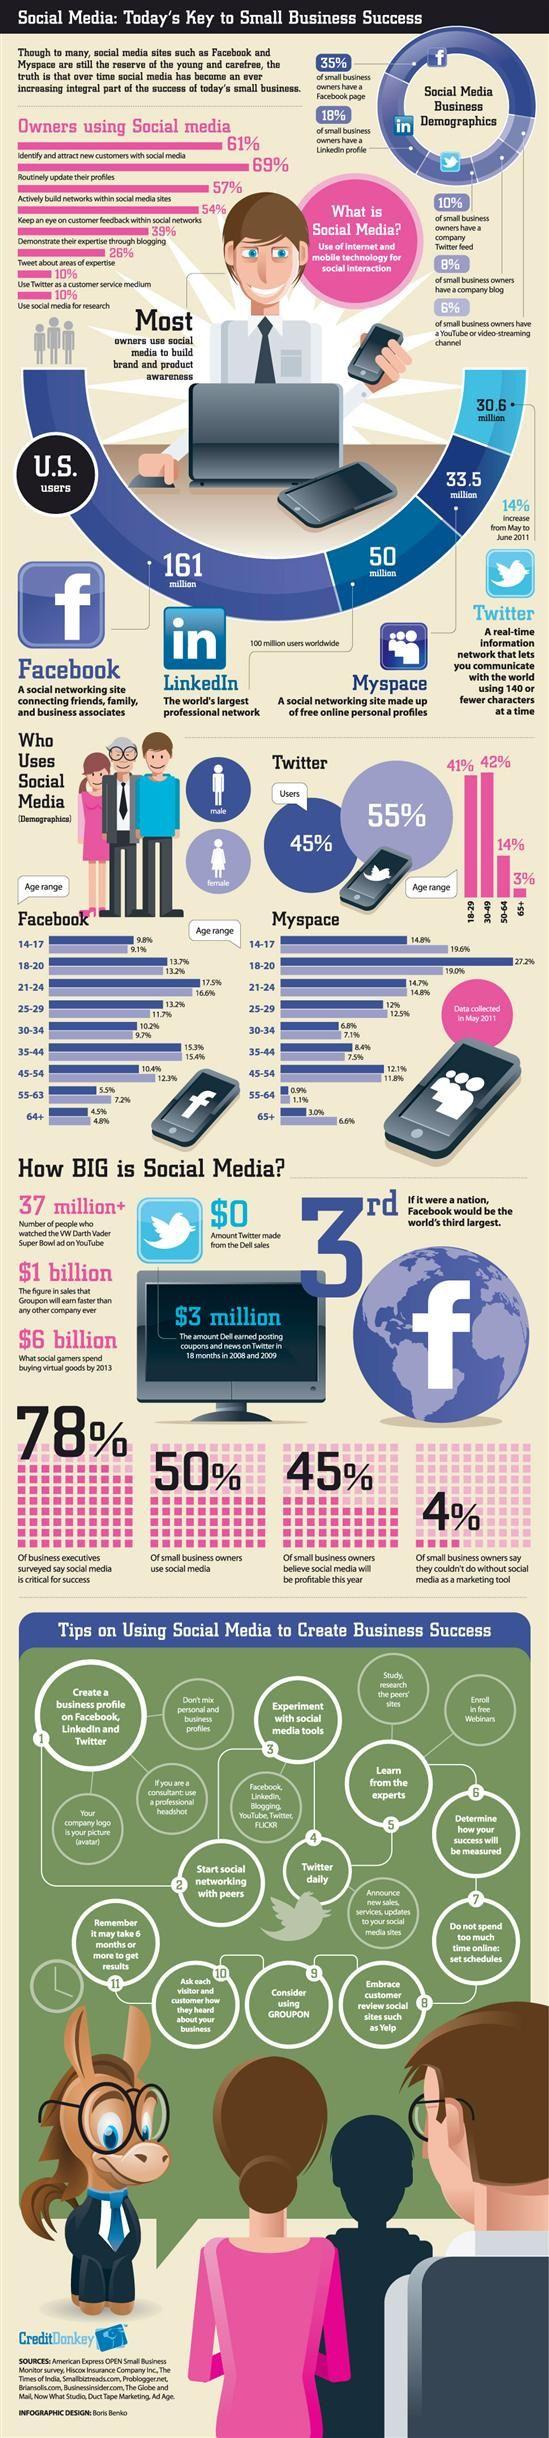 Social Media - Key to small business success: Today S Key, Keys, Social Media, Small Businesses, Business Success, Socialmedia, Infographics, Medium, Smallbusinesses